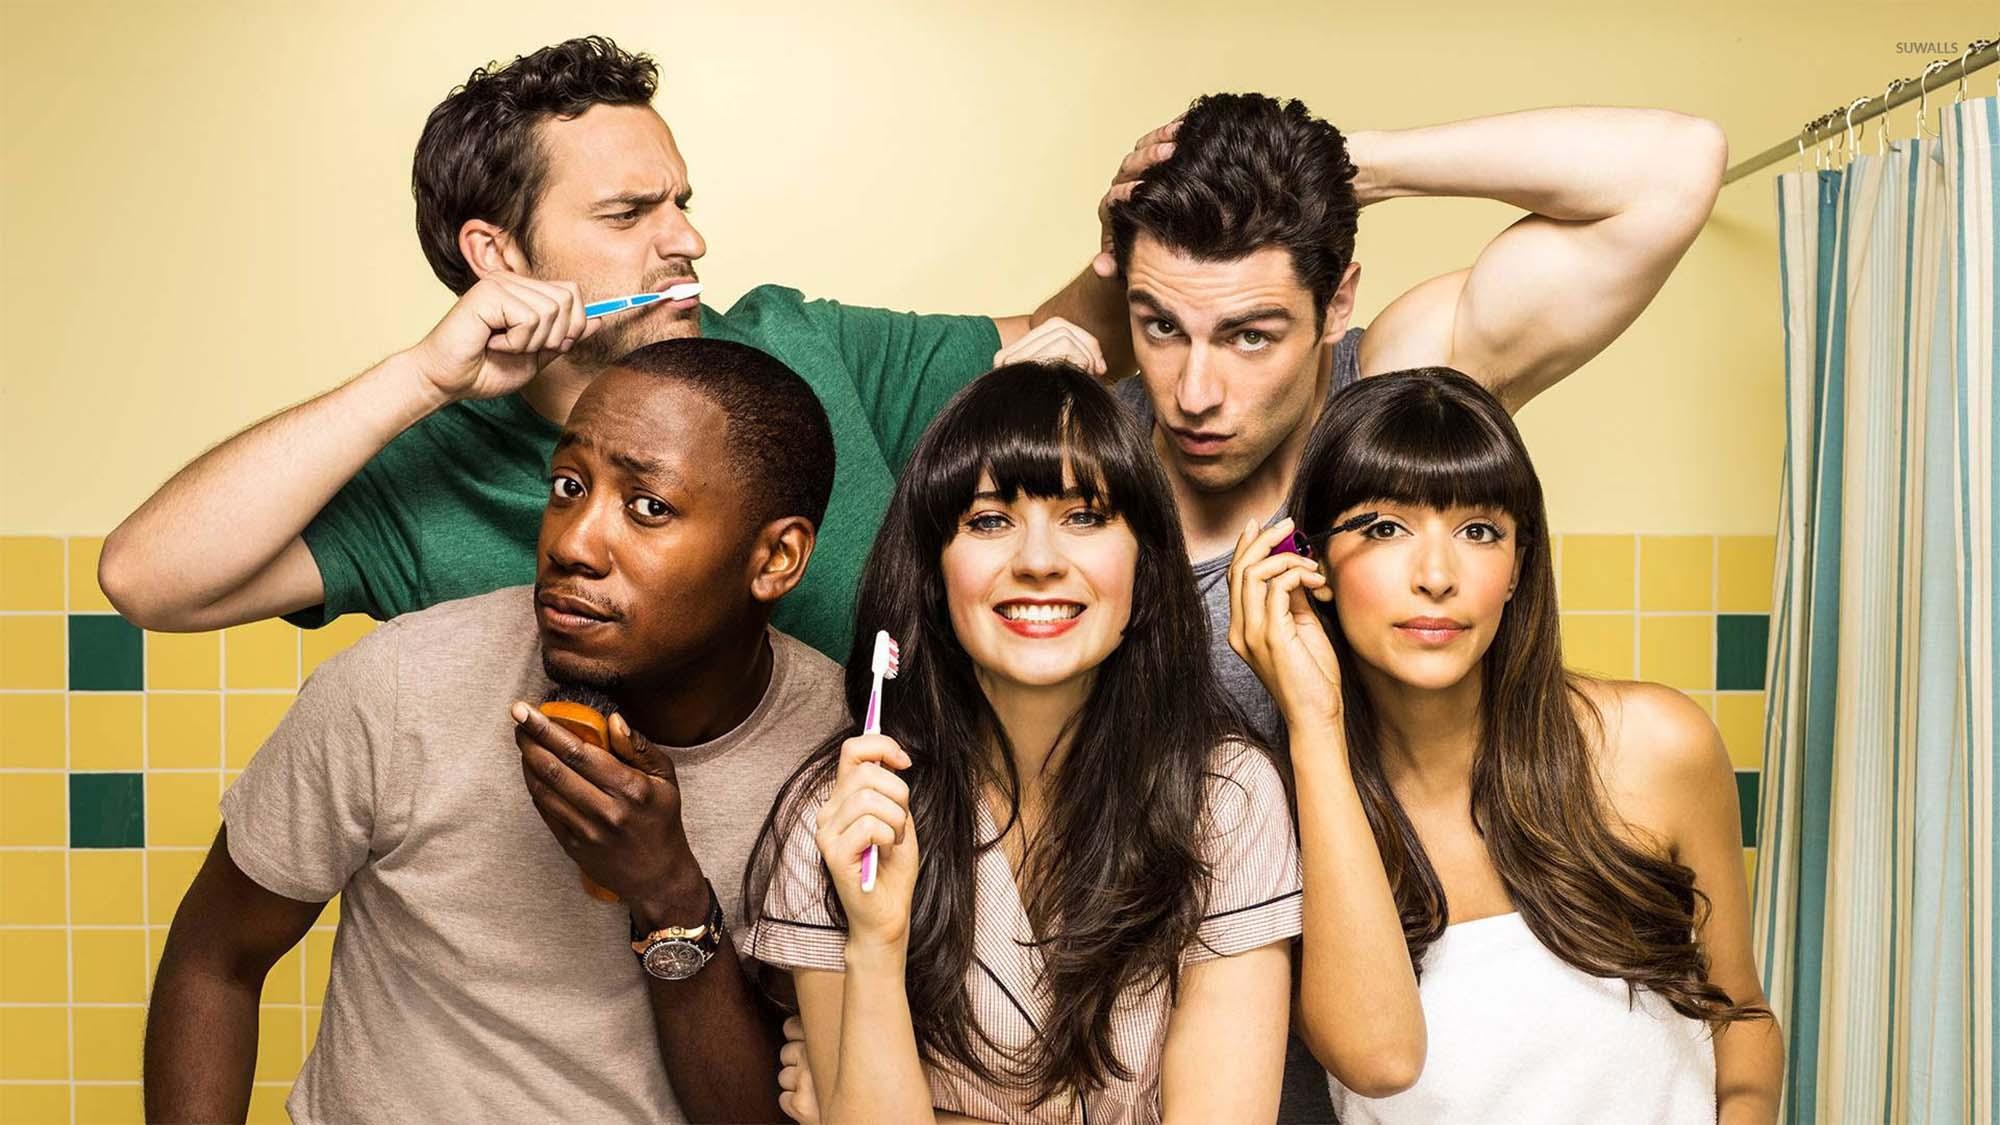 New Girl's friendship quintet Nick, Schmidt, Winston, Jess and Cece cram into the bathroom.